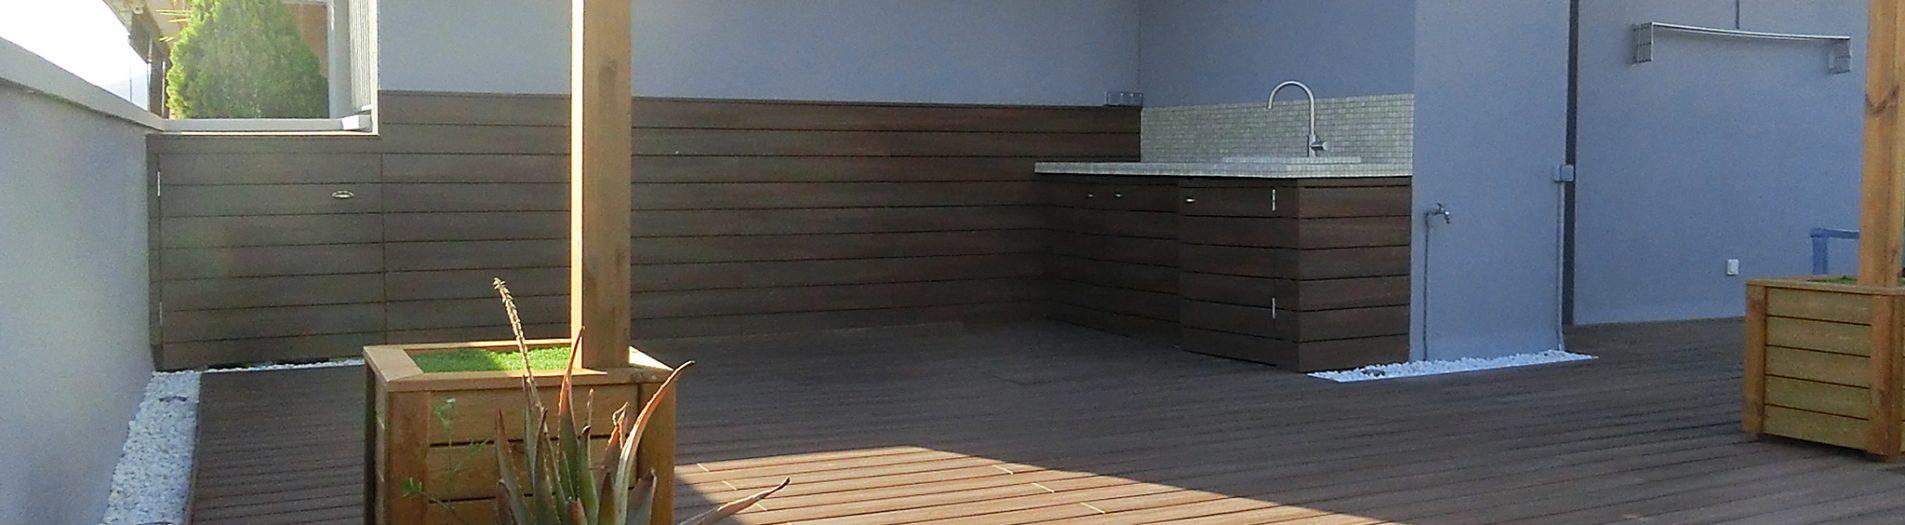 Terrace in Girona